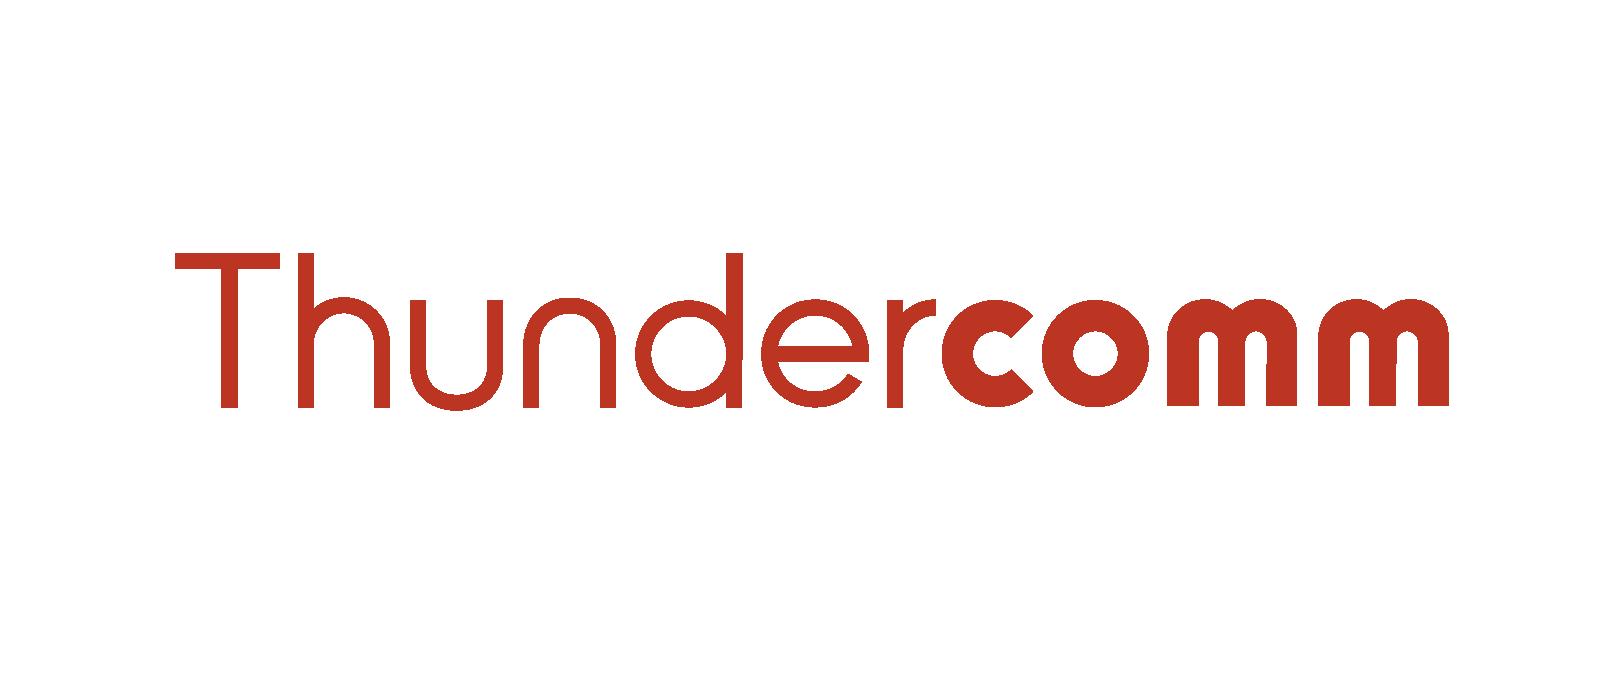 Thundercomm-logo-0624-01